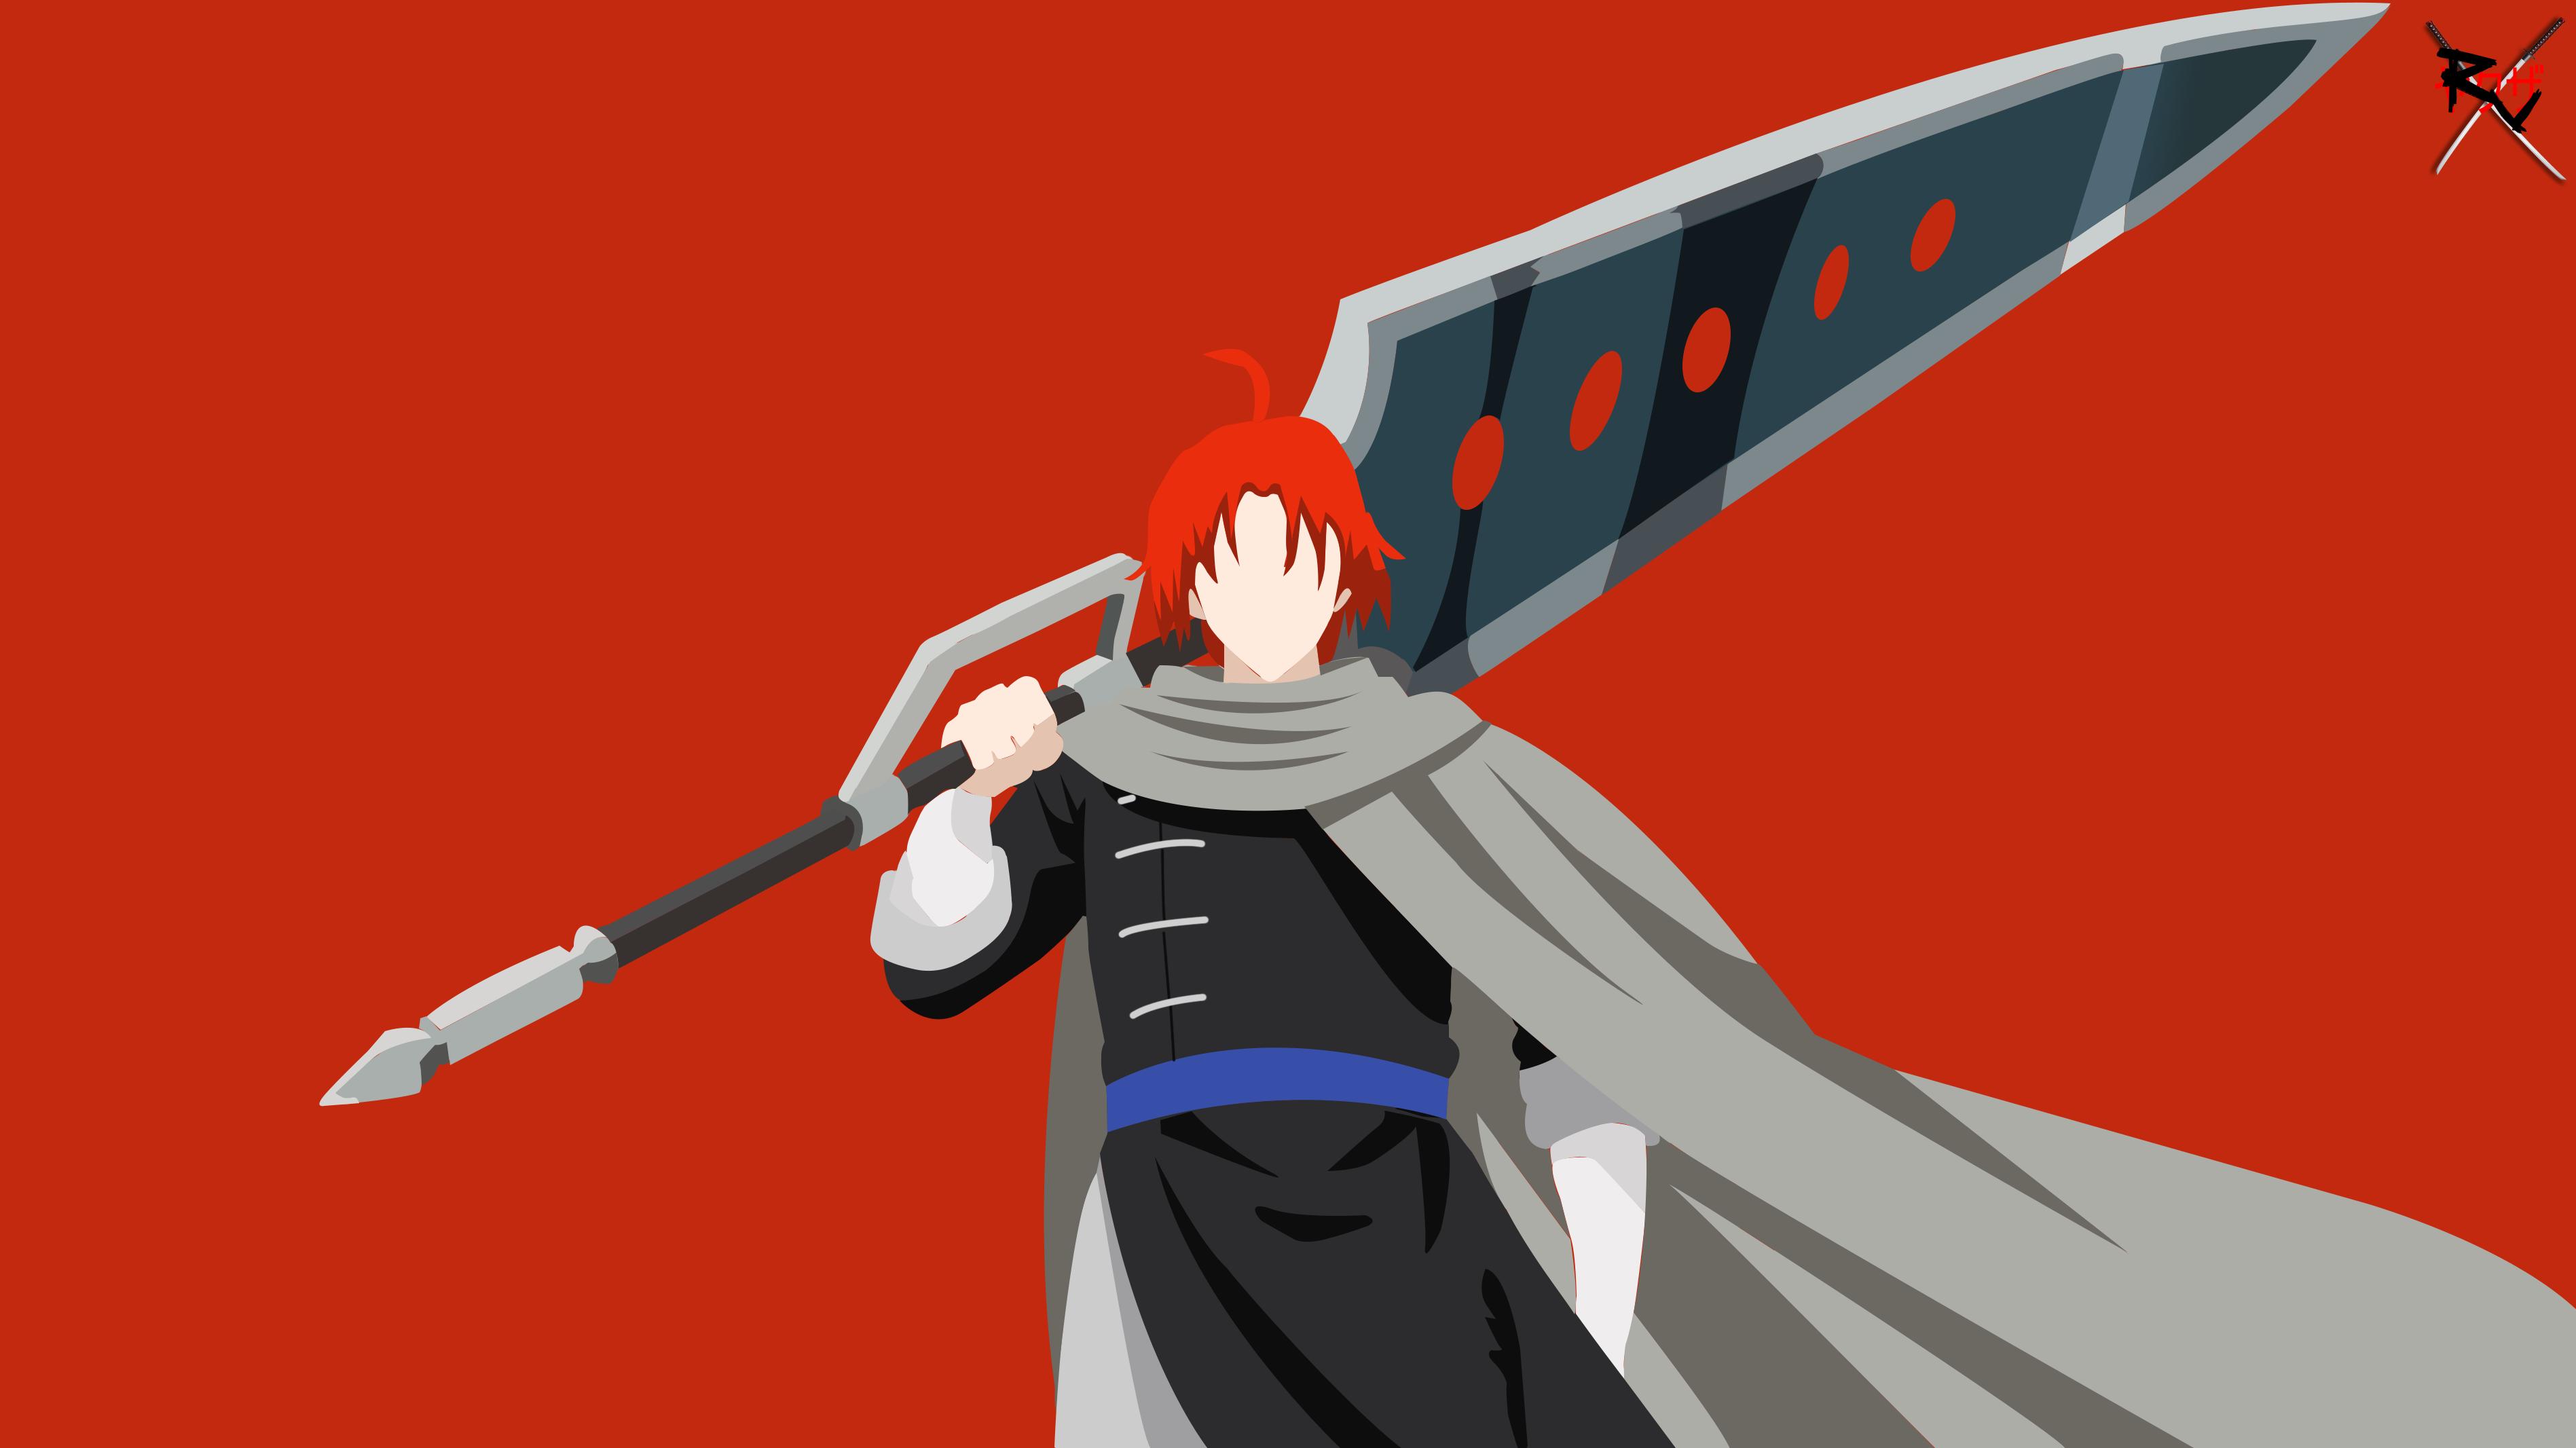 Sephiroth508 26 2 Kamui GinTama By Bakaisar